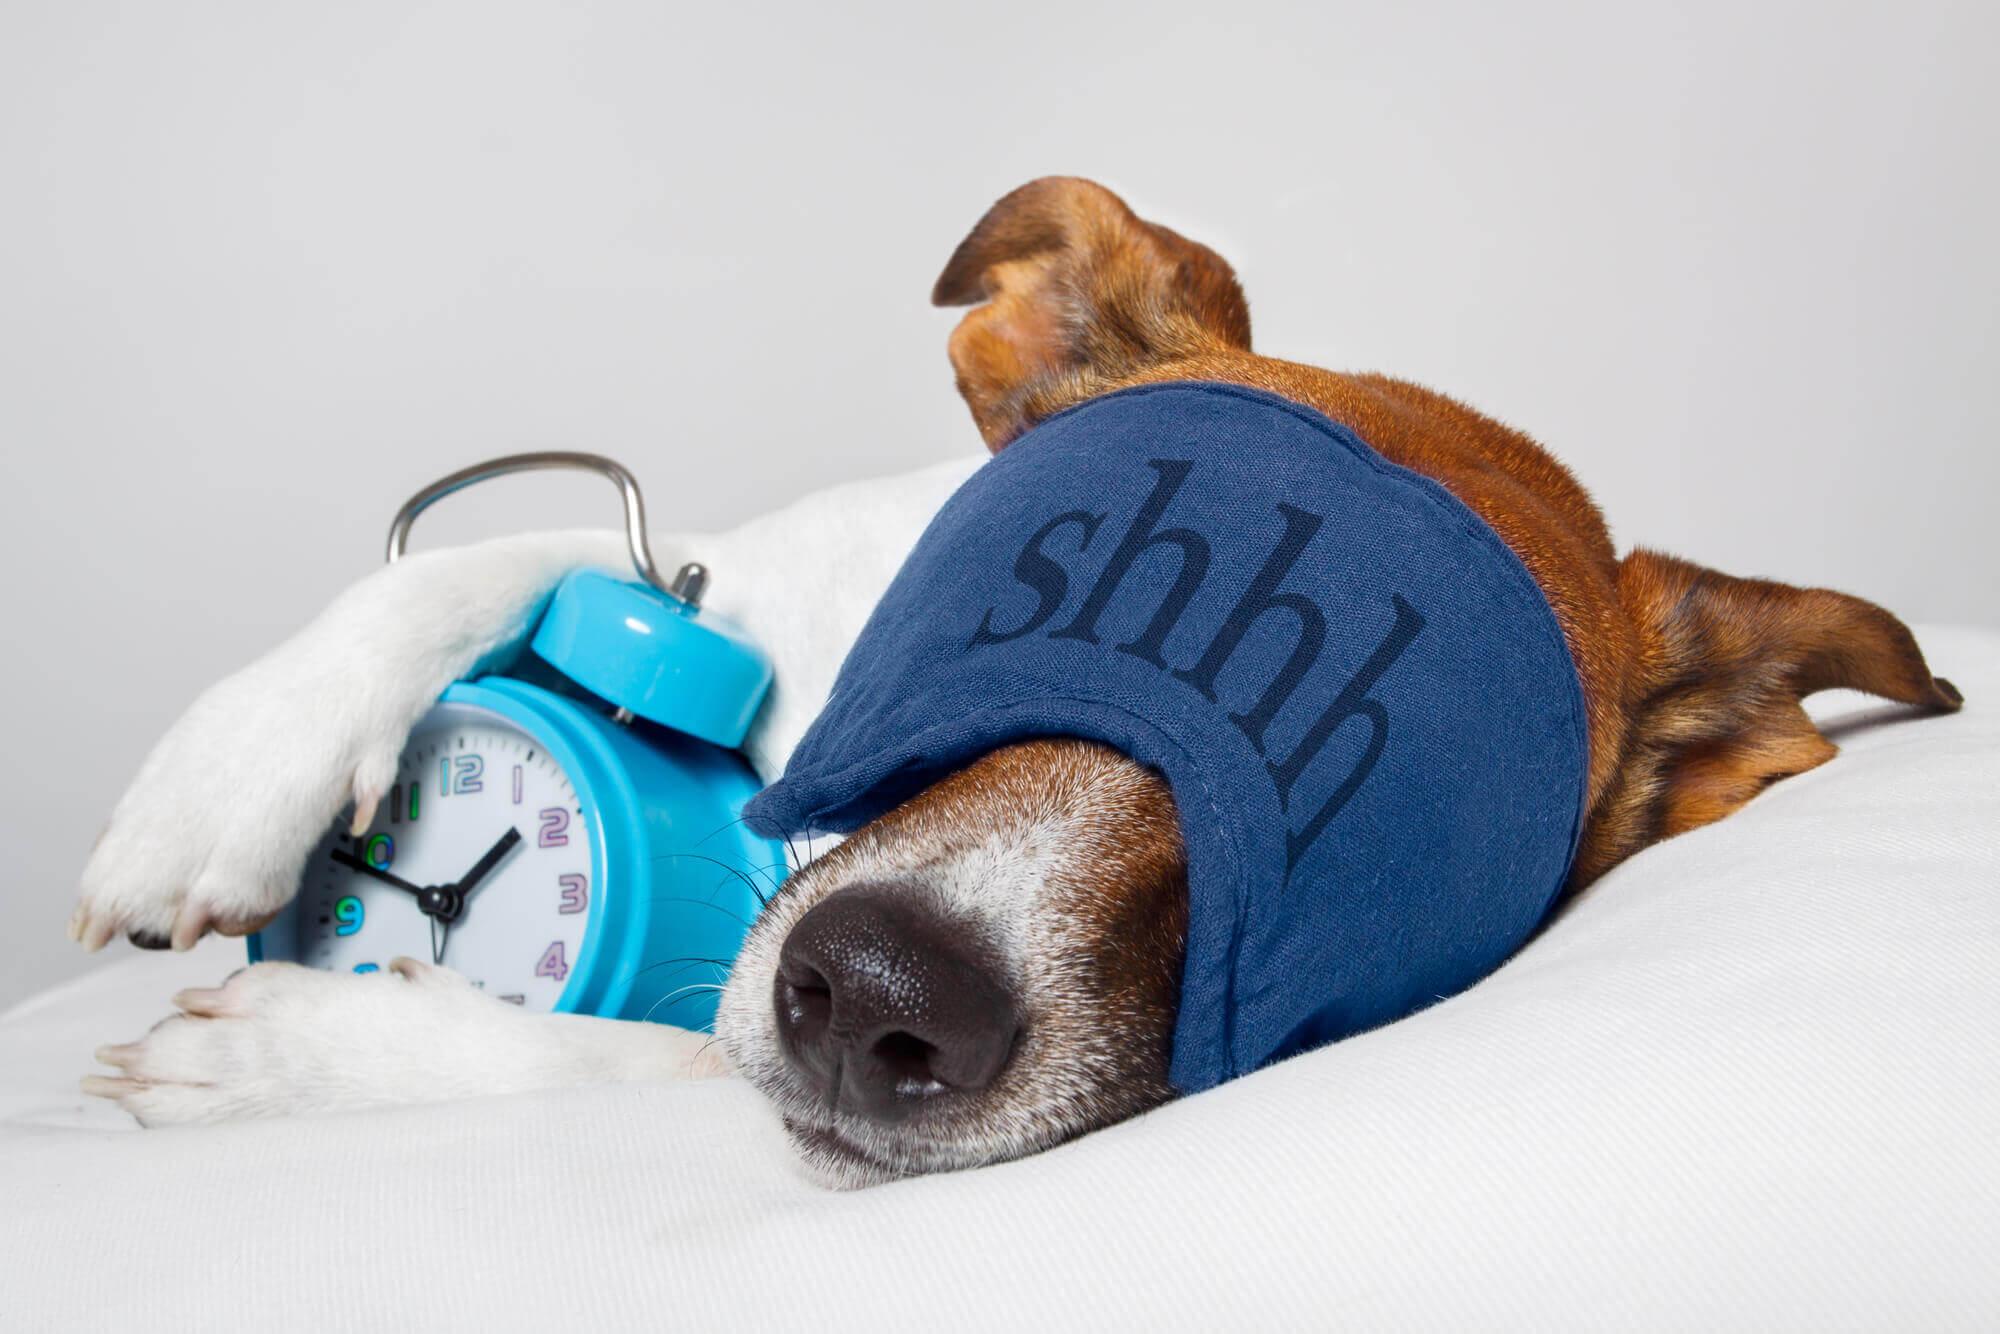 Best Indica Strain For Sleep